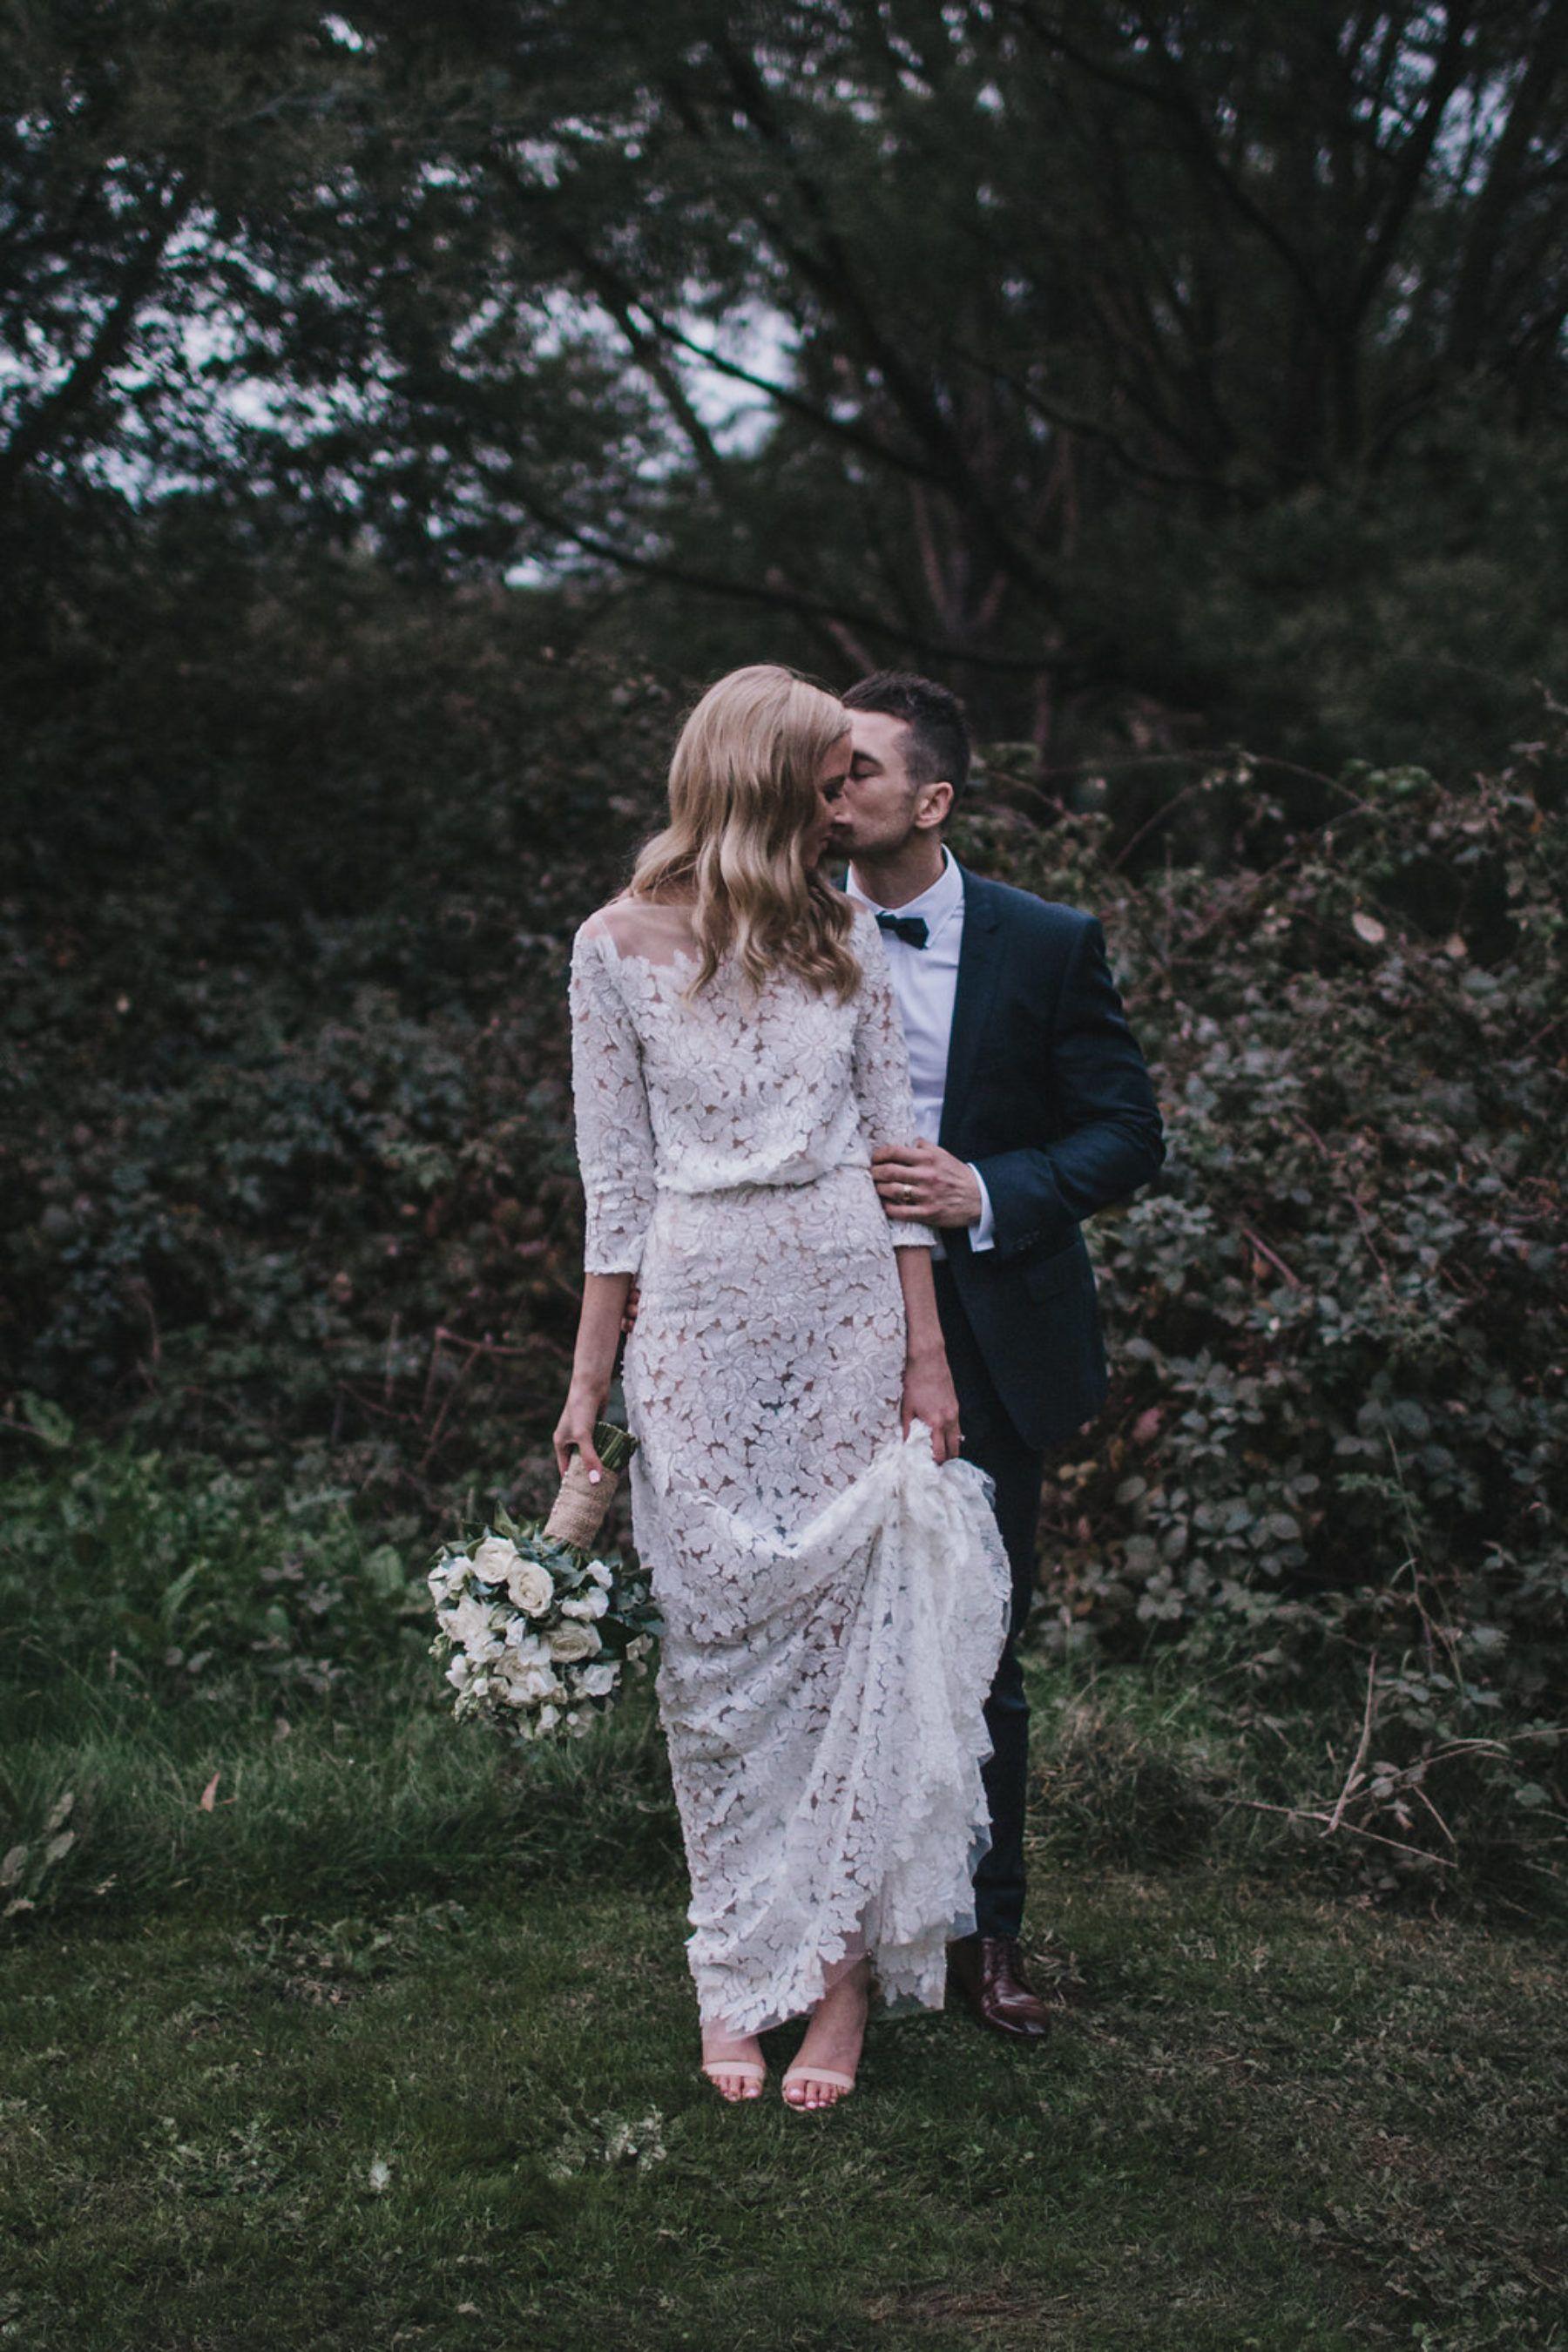 Ash Luke S Yarra Valley Wedding At The Riverstone Estate Nouba Com Au Wedding Dress Long Sleeve Elegant Wedding Gowns Unique Wedding Gowns